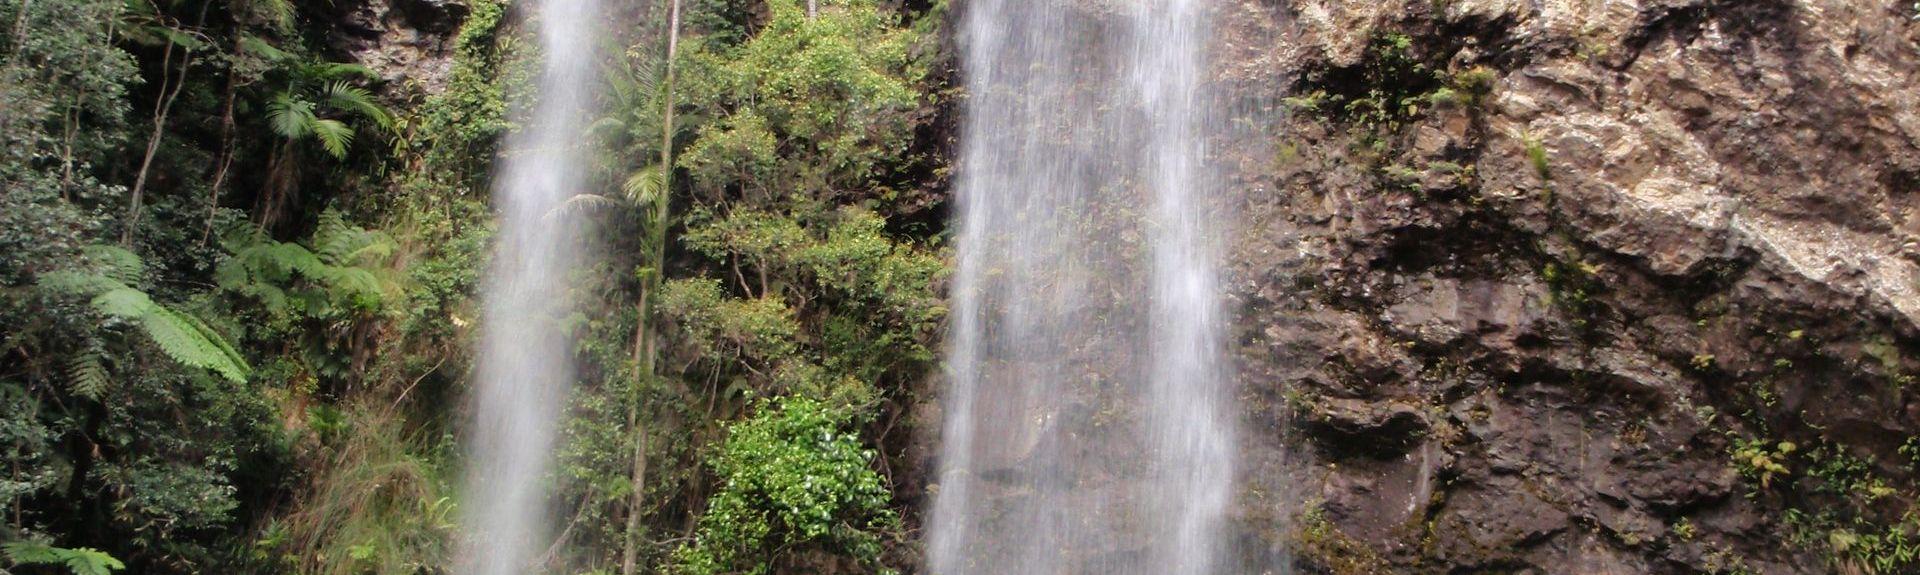 Crystal Creek NSW, Australia